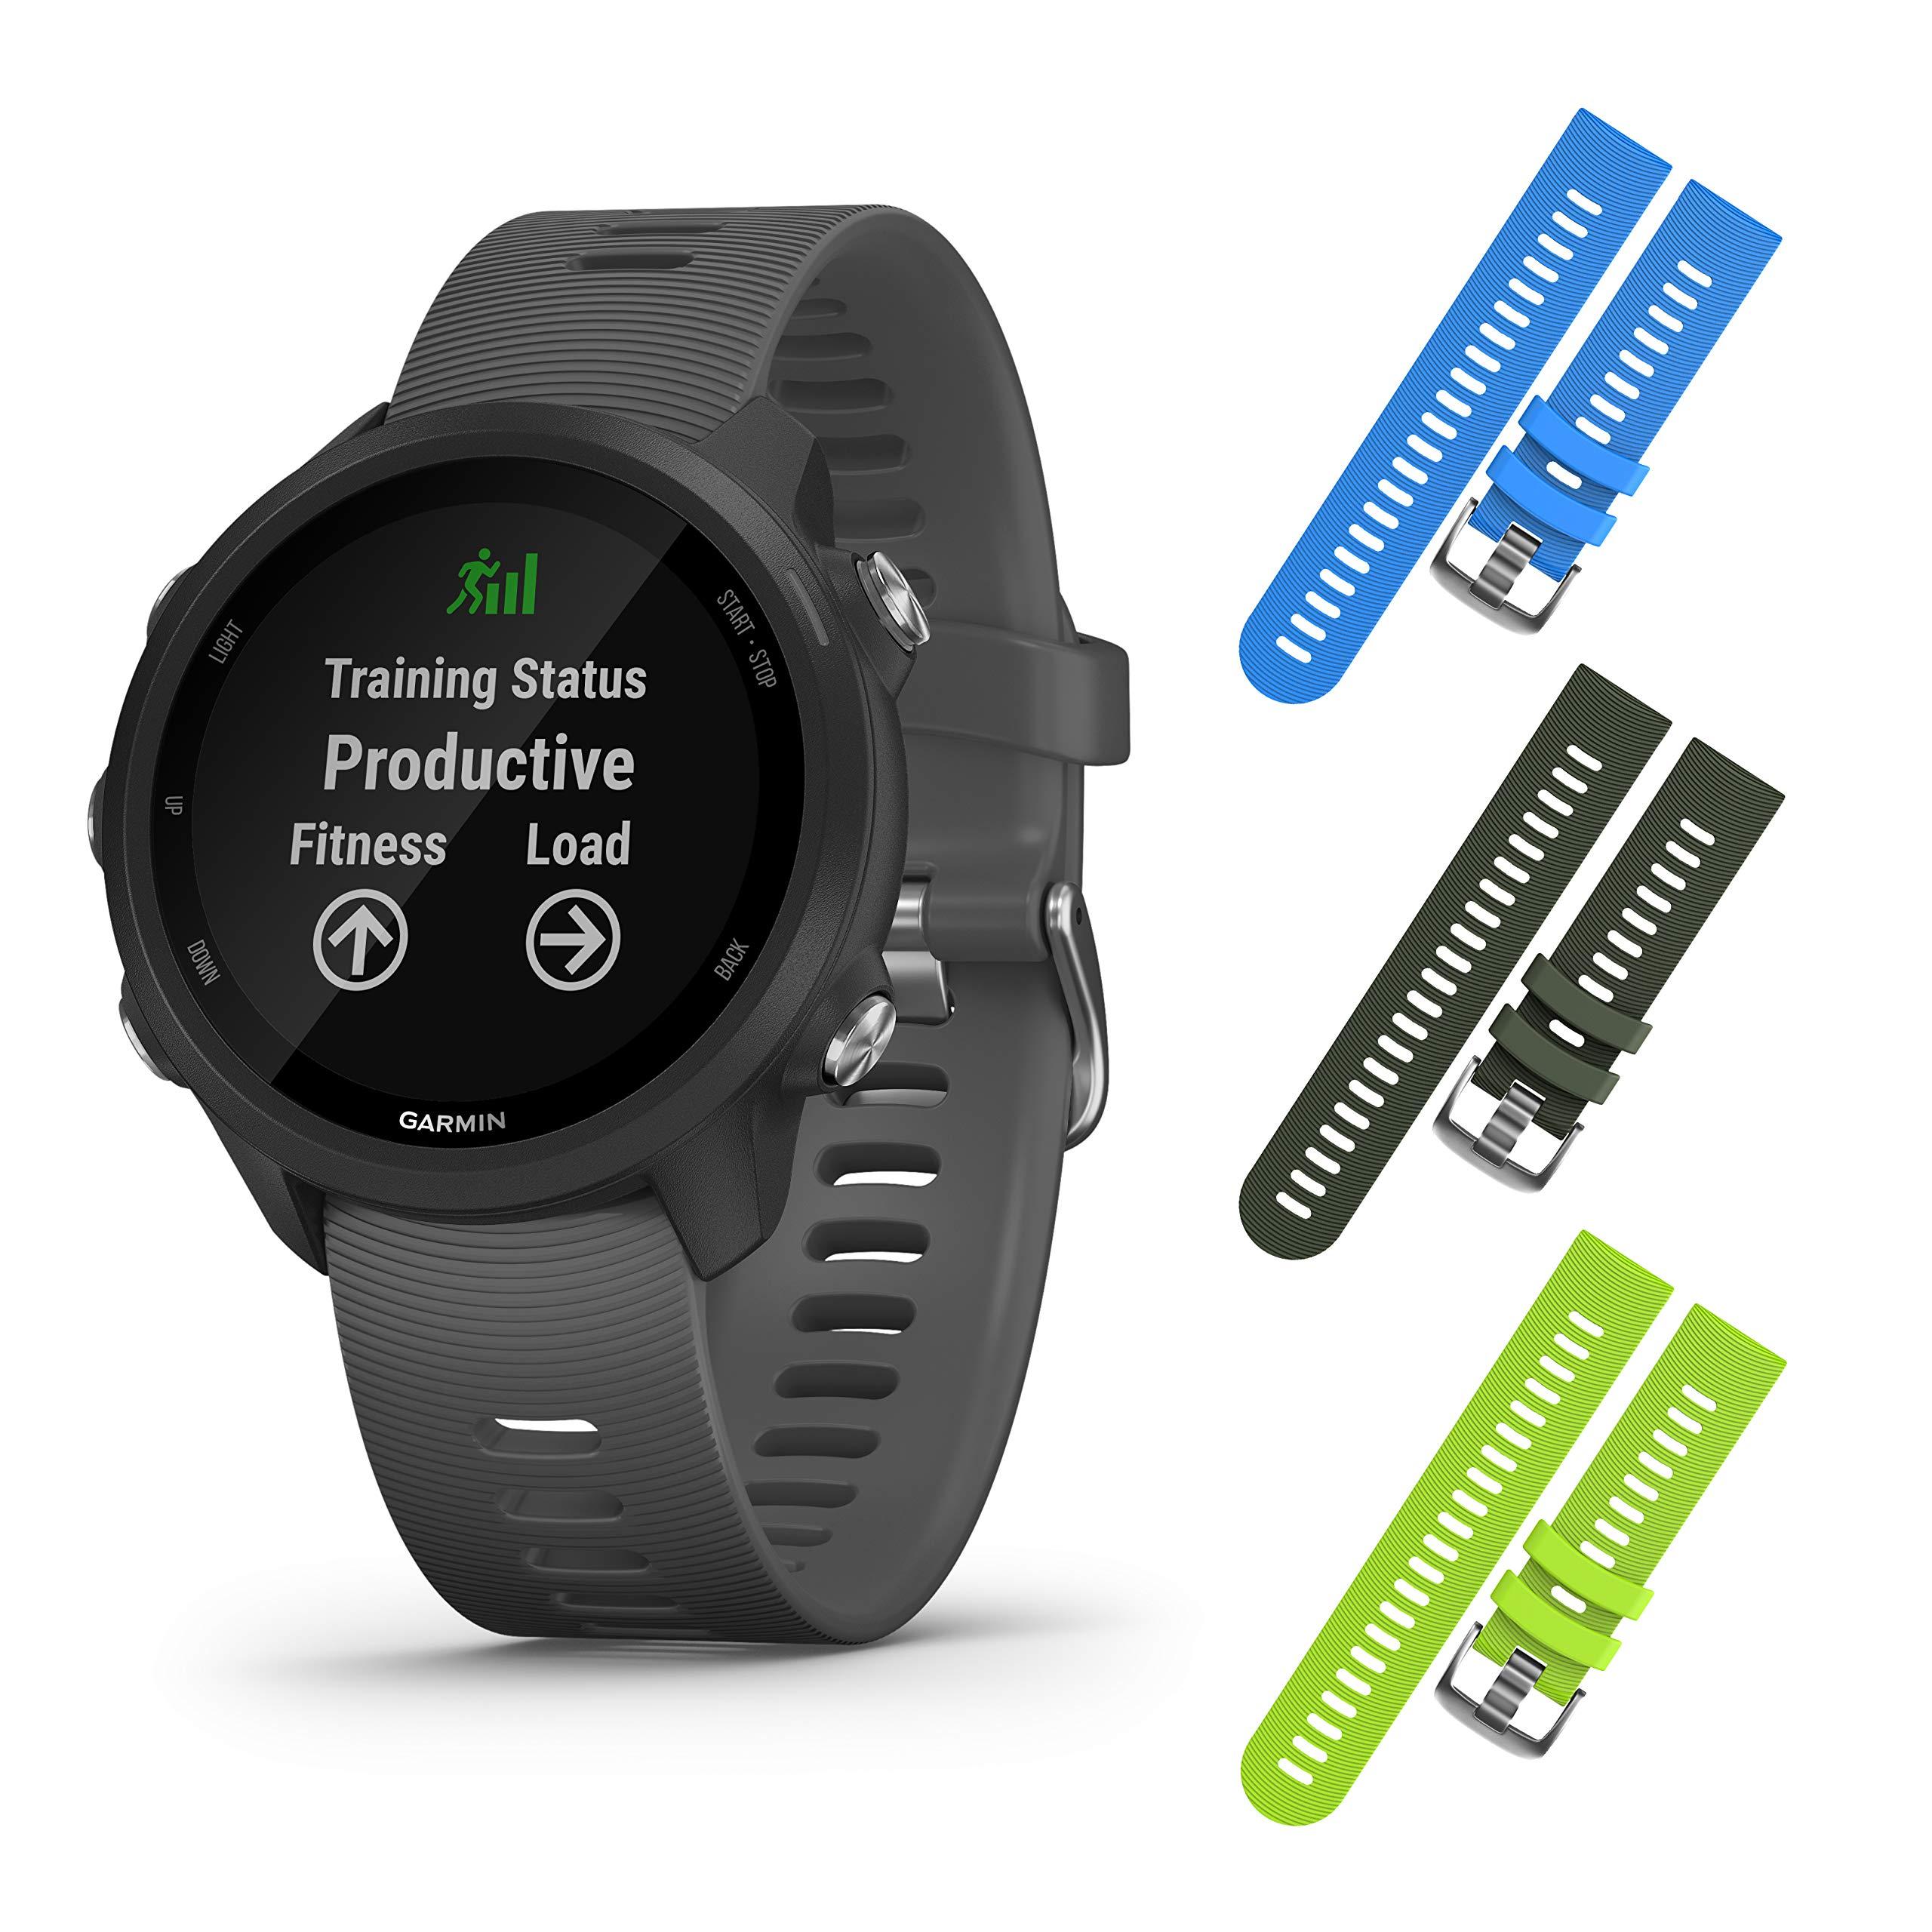 Garmin Forerunner 245 GPS Running Smartwatch with Included Wearable4U 3 Straps Bundle (Slate Grey 010-02120-00, Blue/Khaki/Lime)